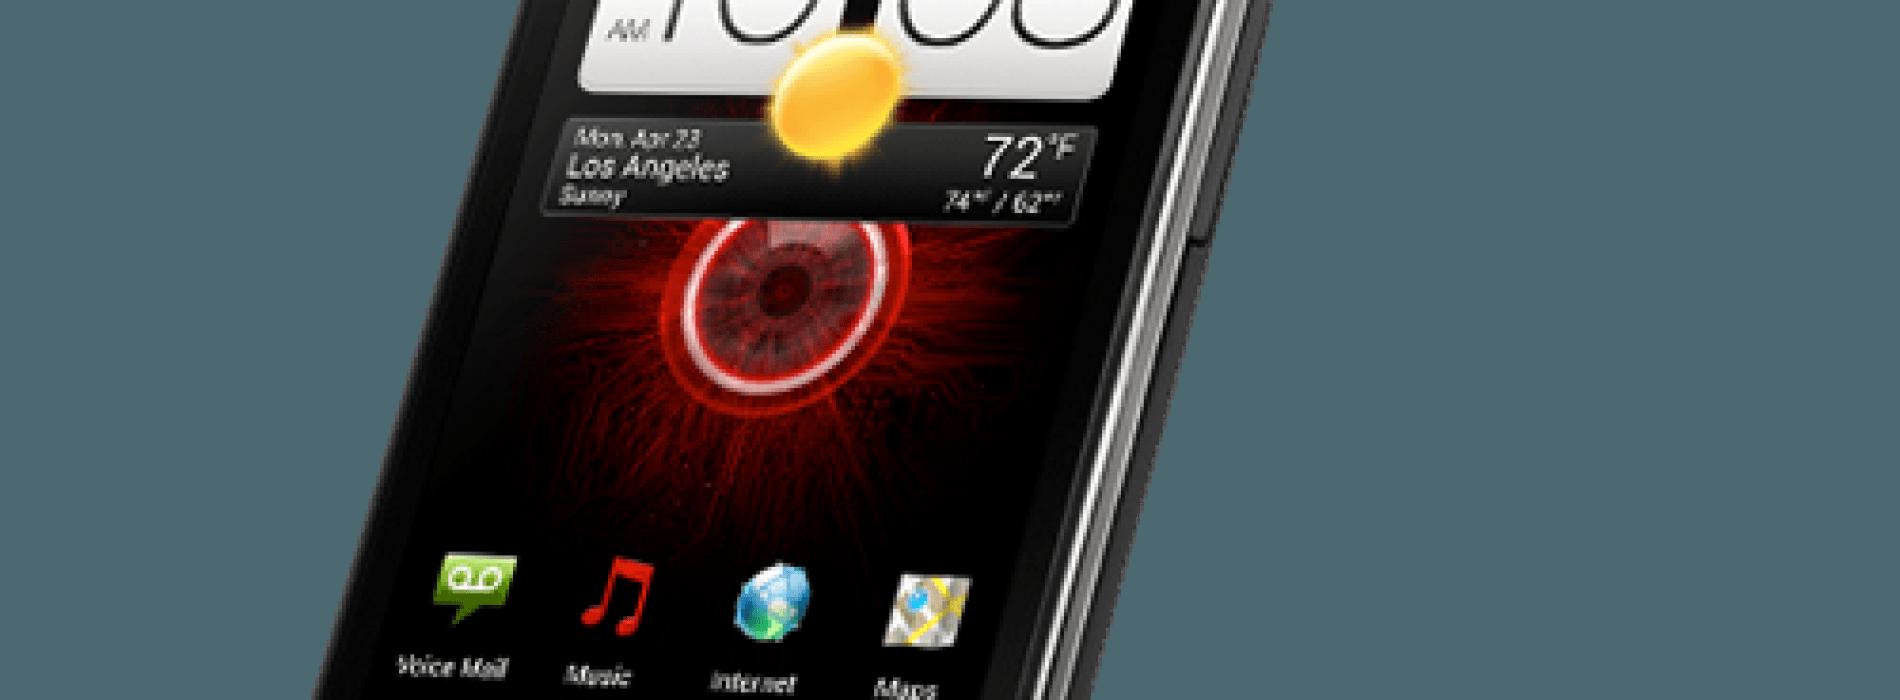 Droid Incredible Vs. Nexus One